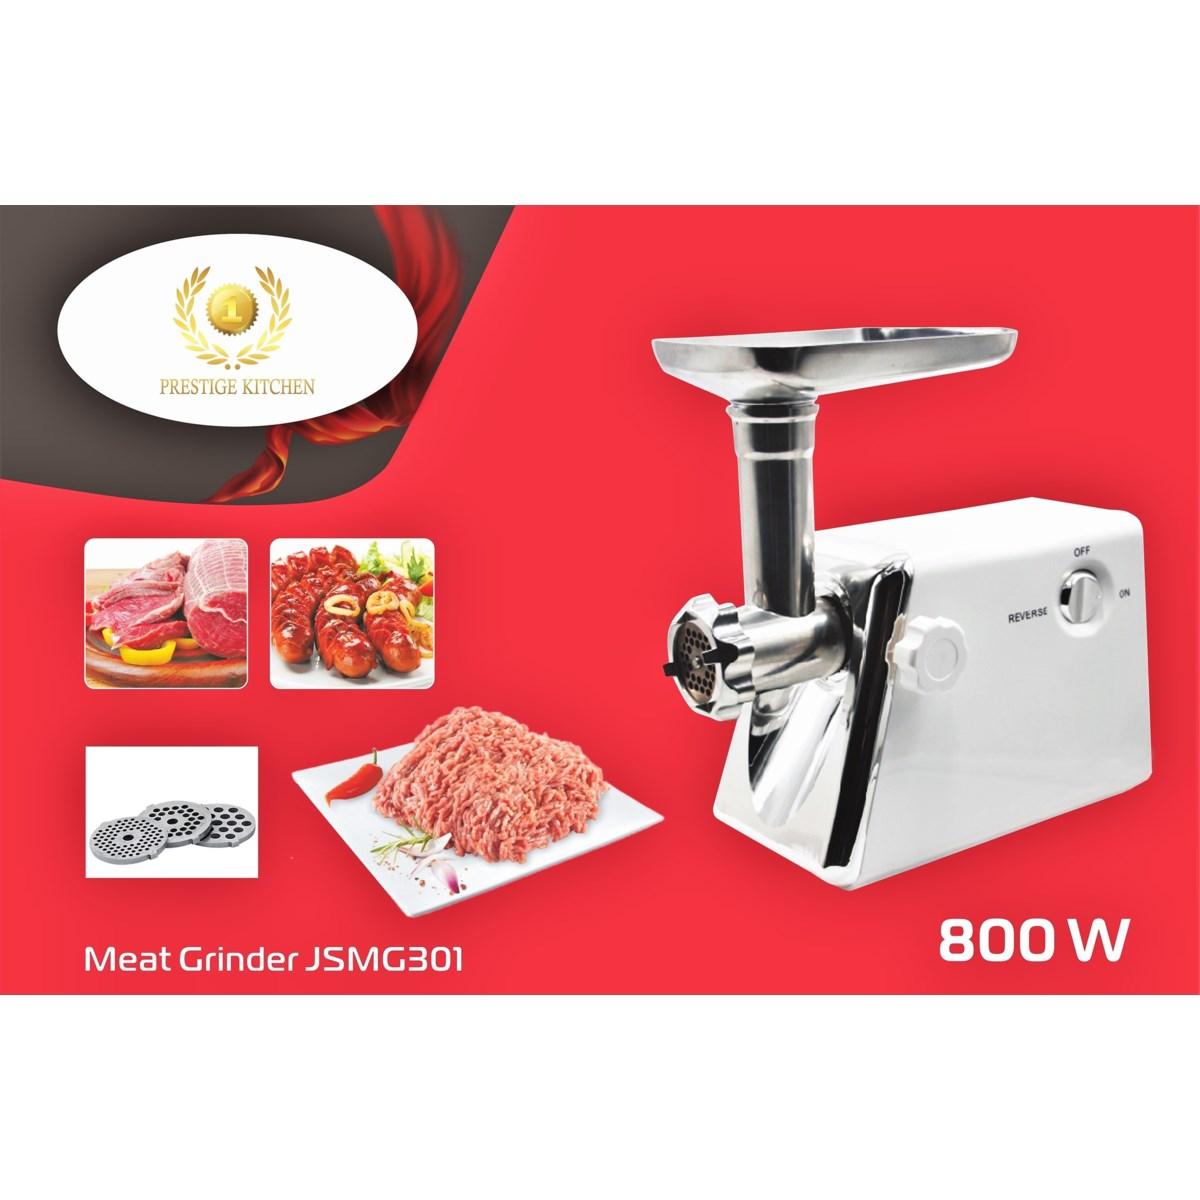 Meat Grinder 800W (Max Lock 1200W) - ETL Copper Motor - 3pc S/S Blade - Sausage/Kebbe